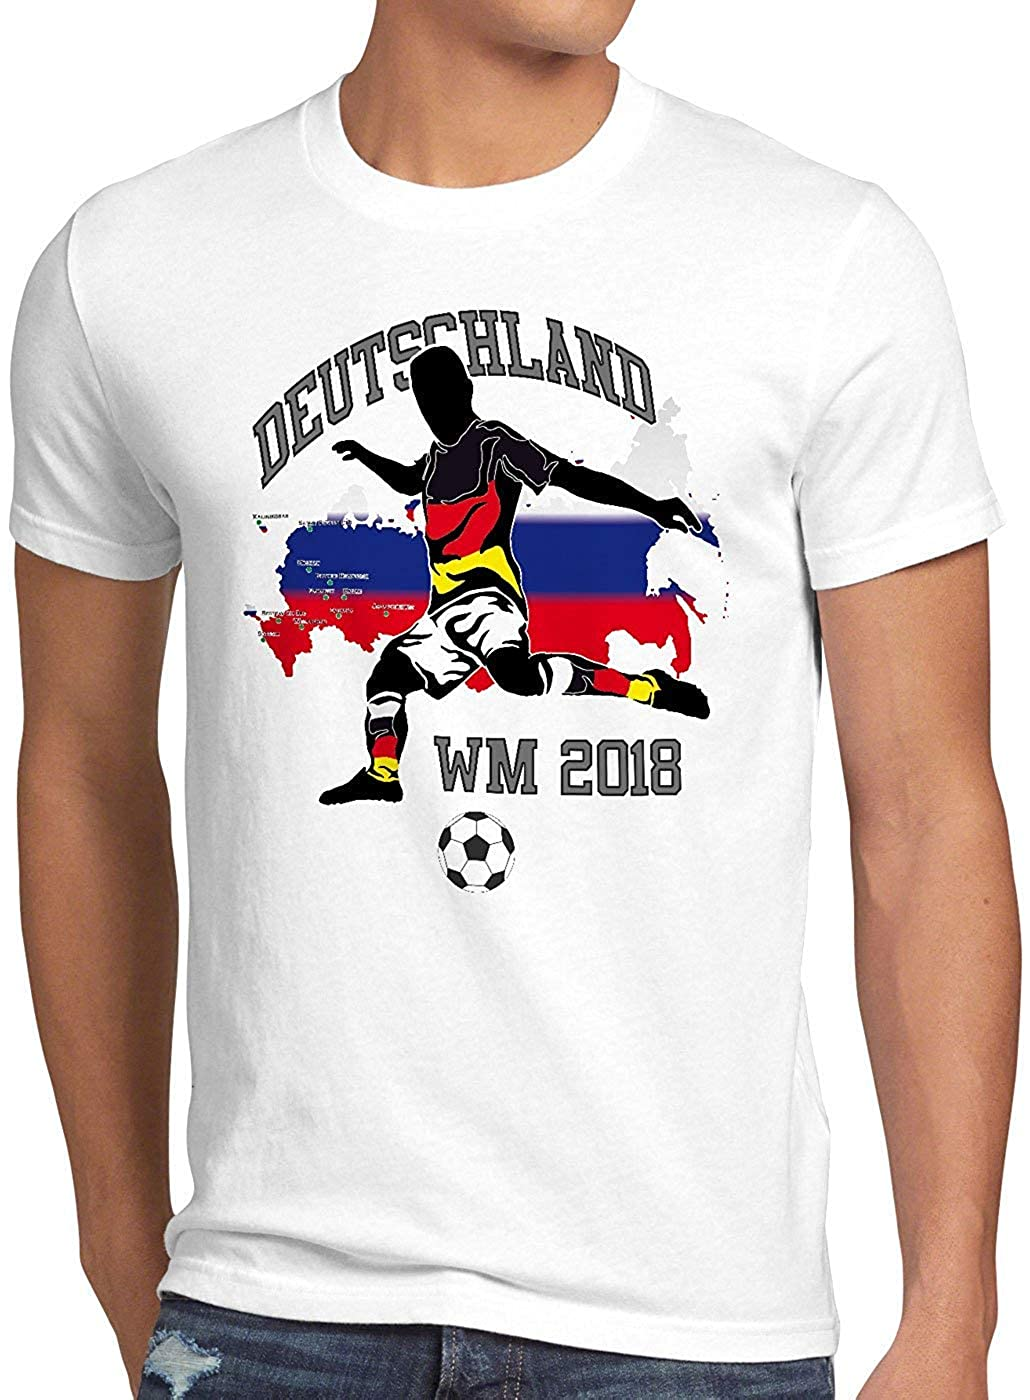 e3412589e6b Freestyle Tee WM 2018 German Football World Cup Men s T-Shirt ...